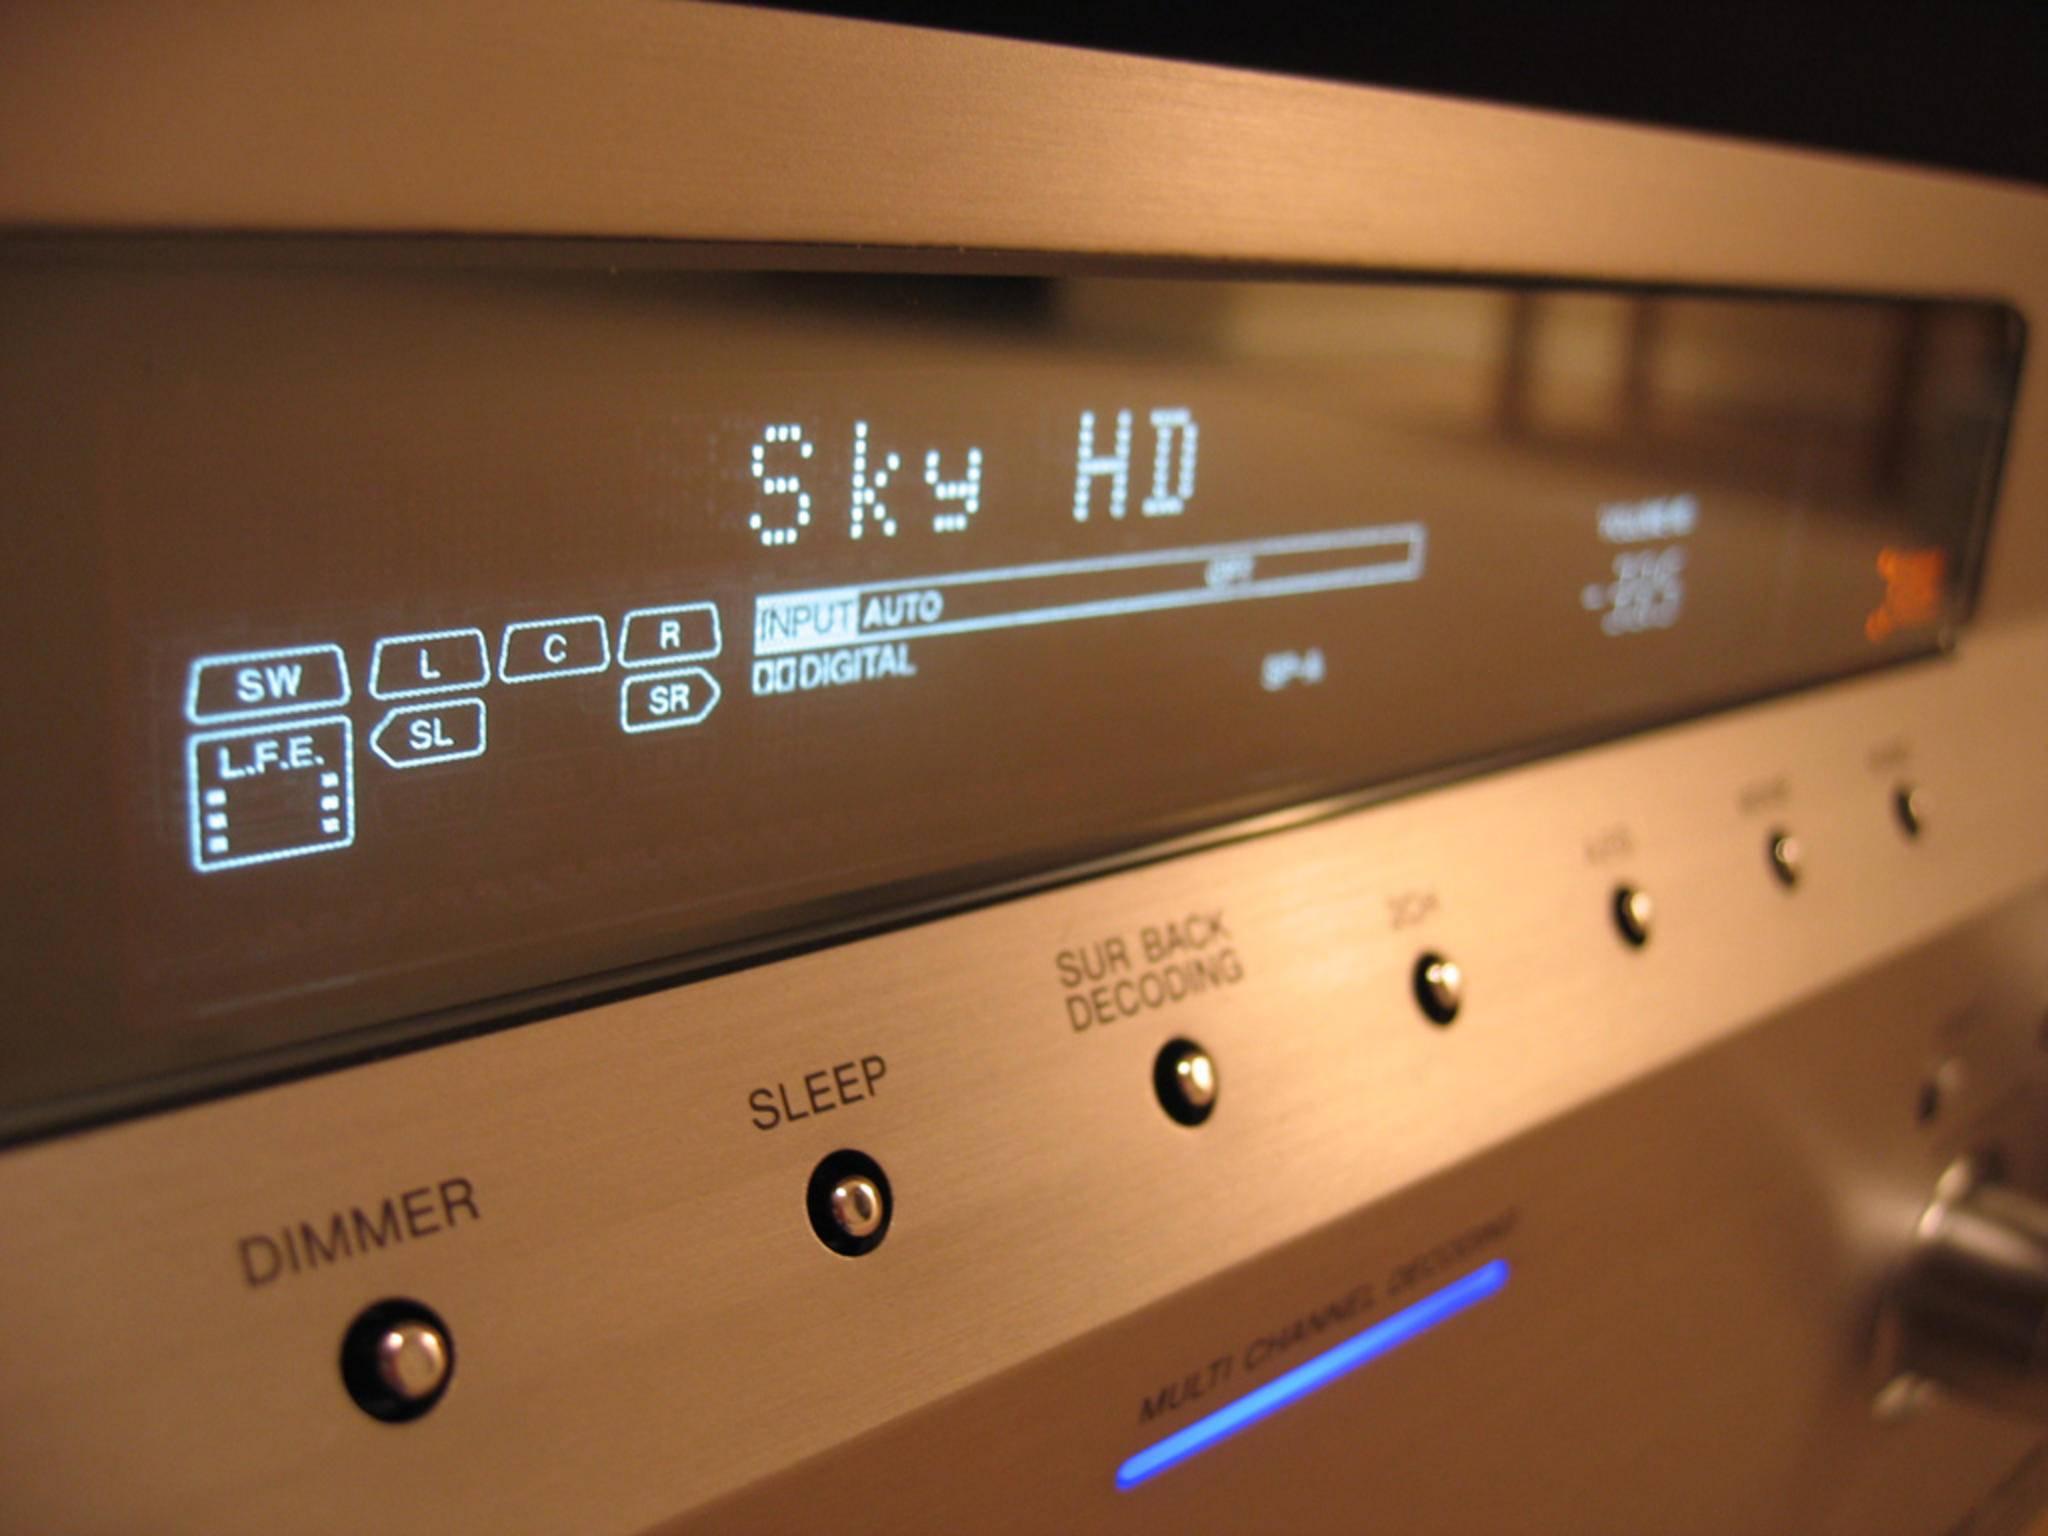 Auch ein AV-Receiver wird am bequemsten per HDMI an den TV angeschlossen.